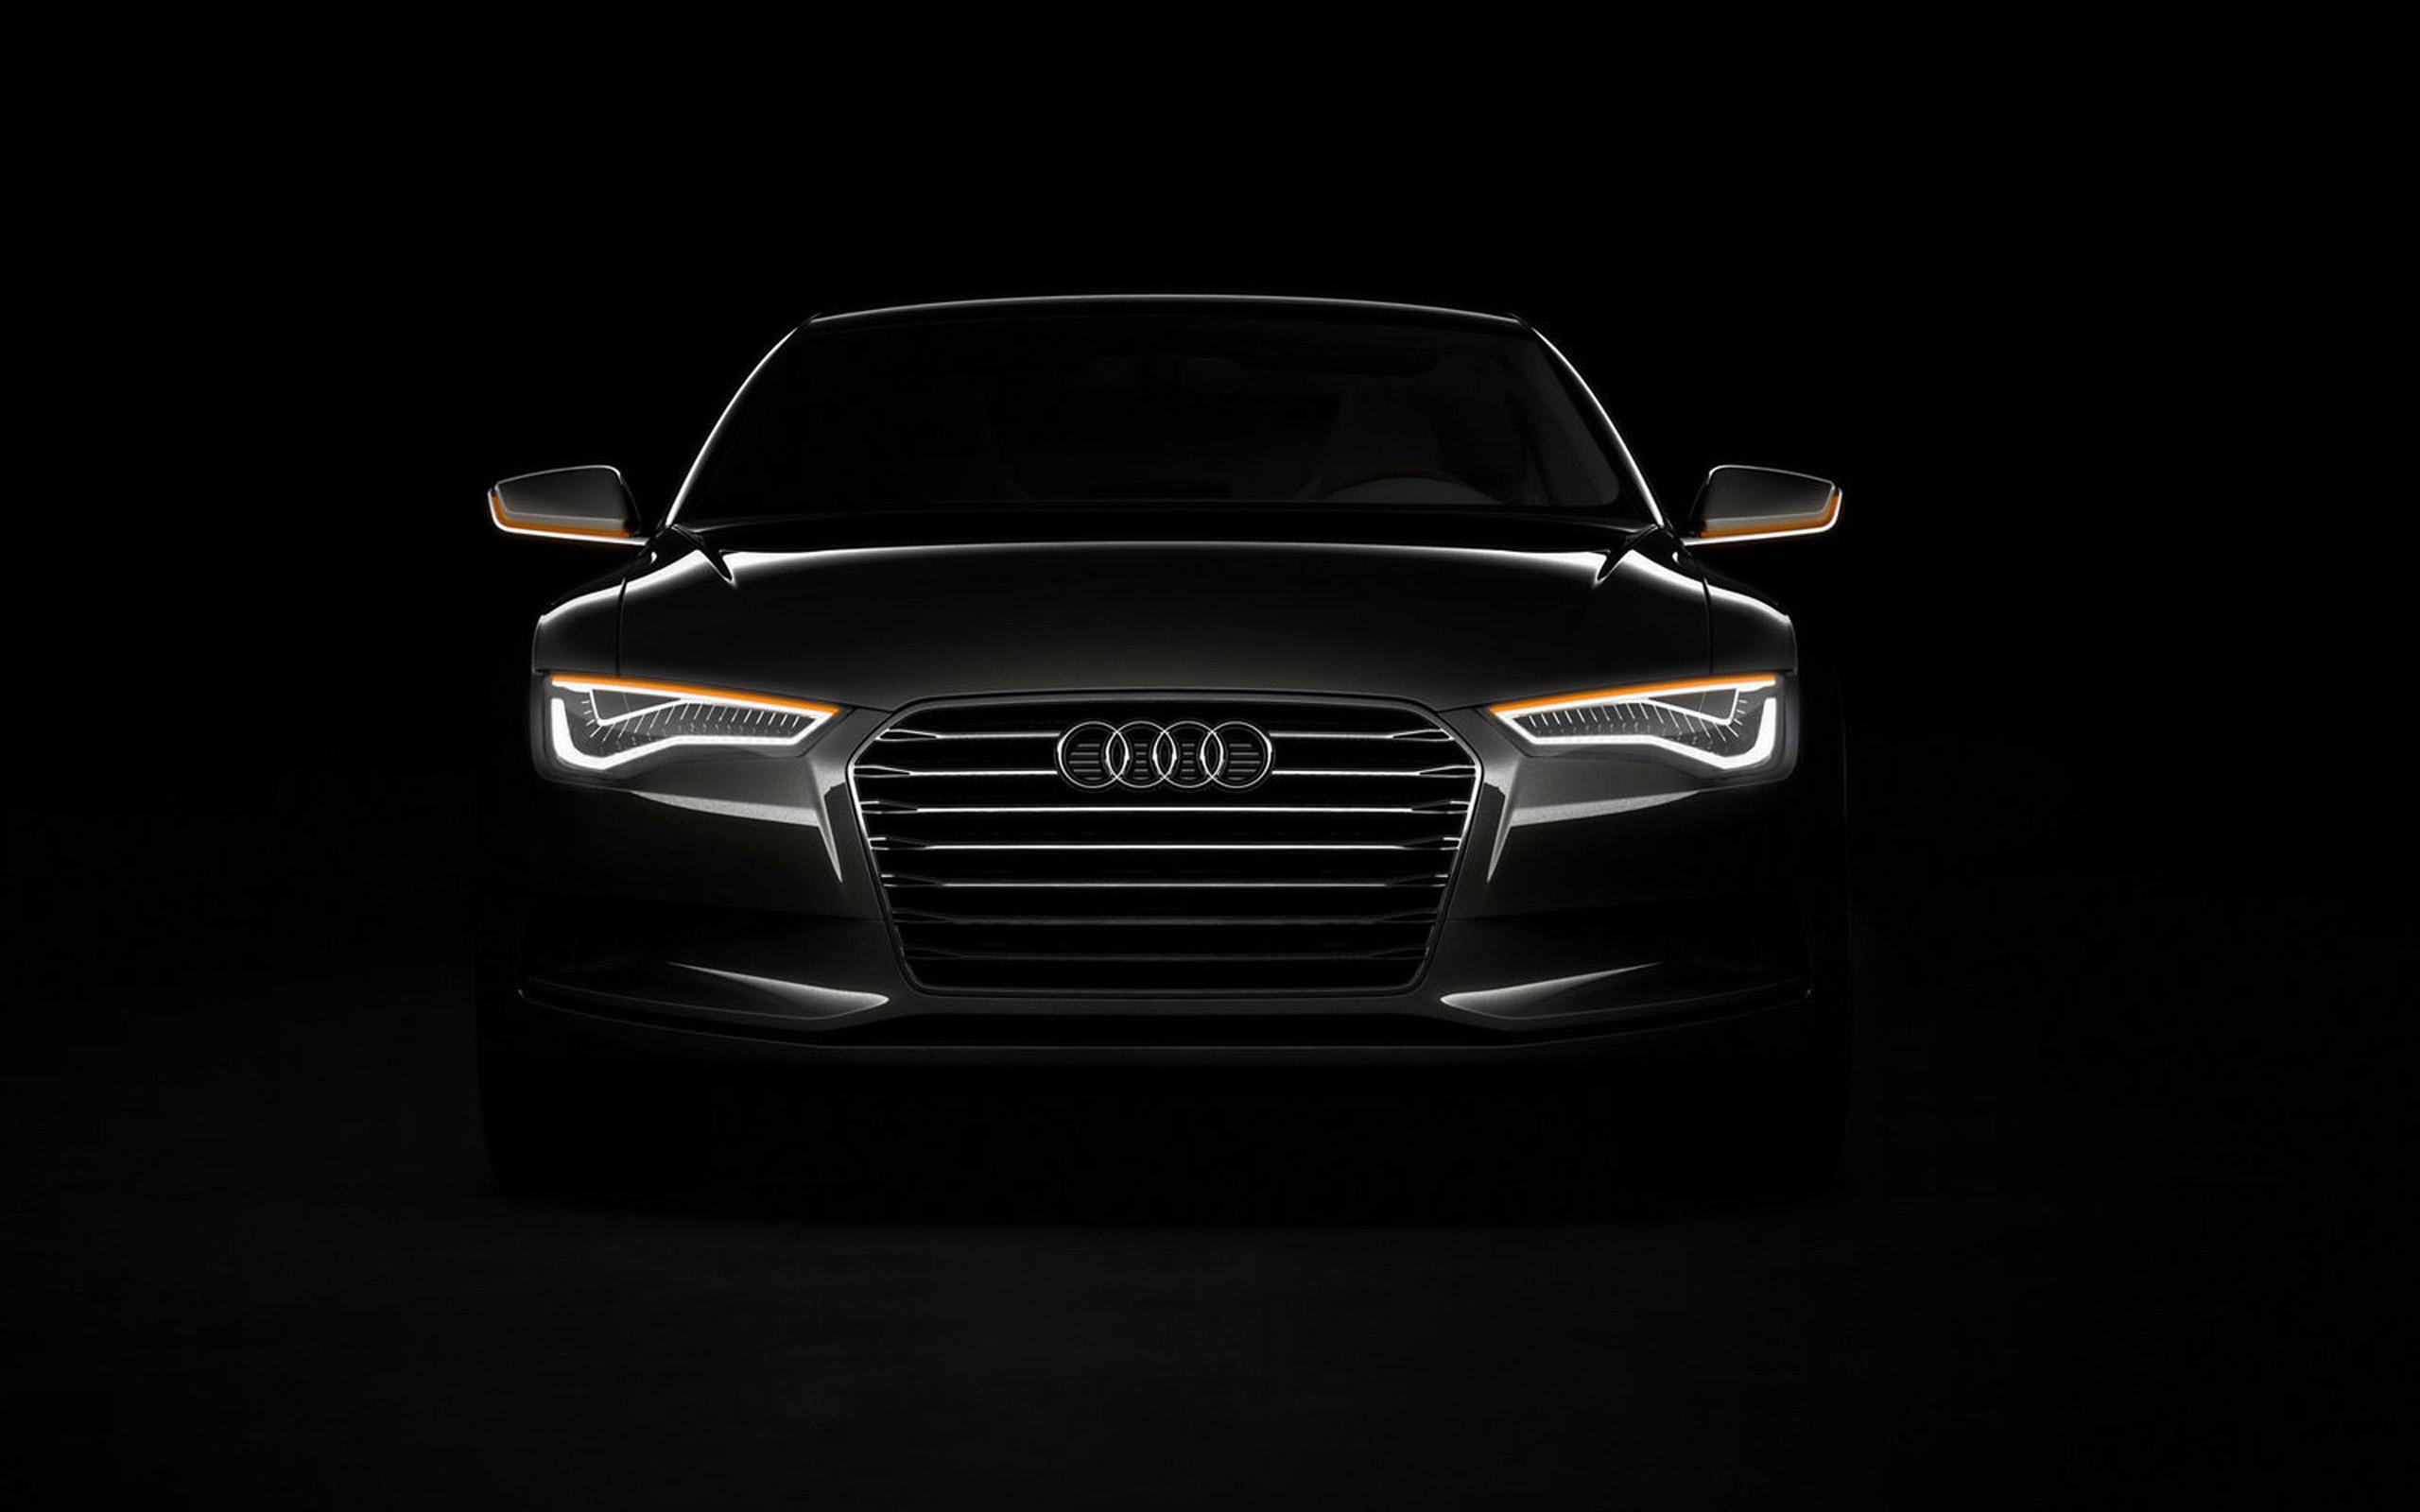 Audi Wallpaper 13 2560x1600